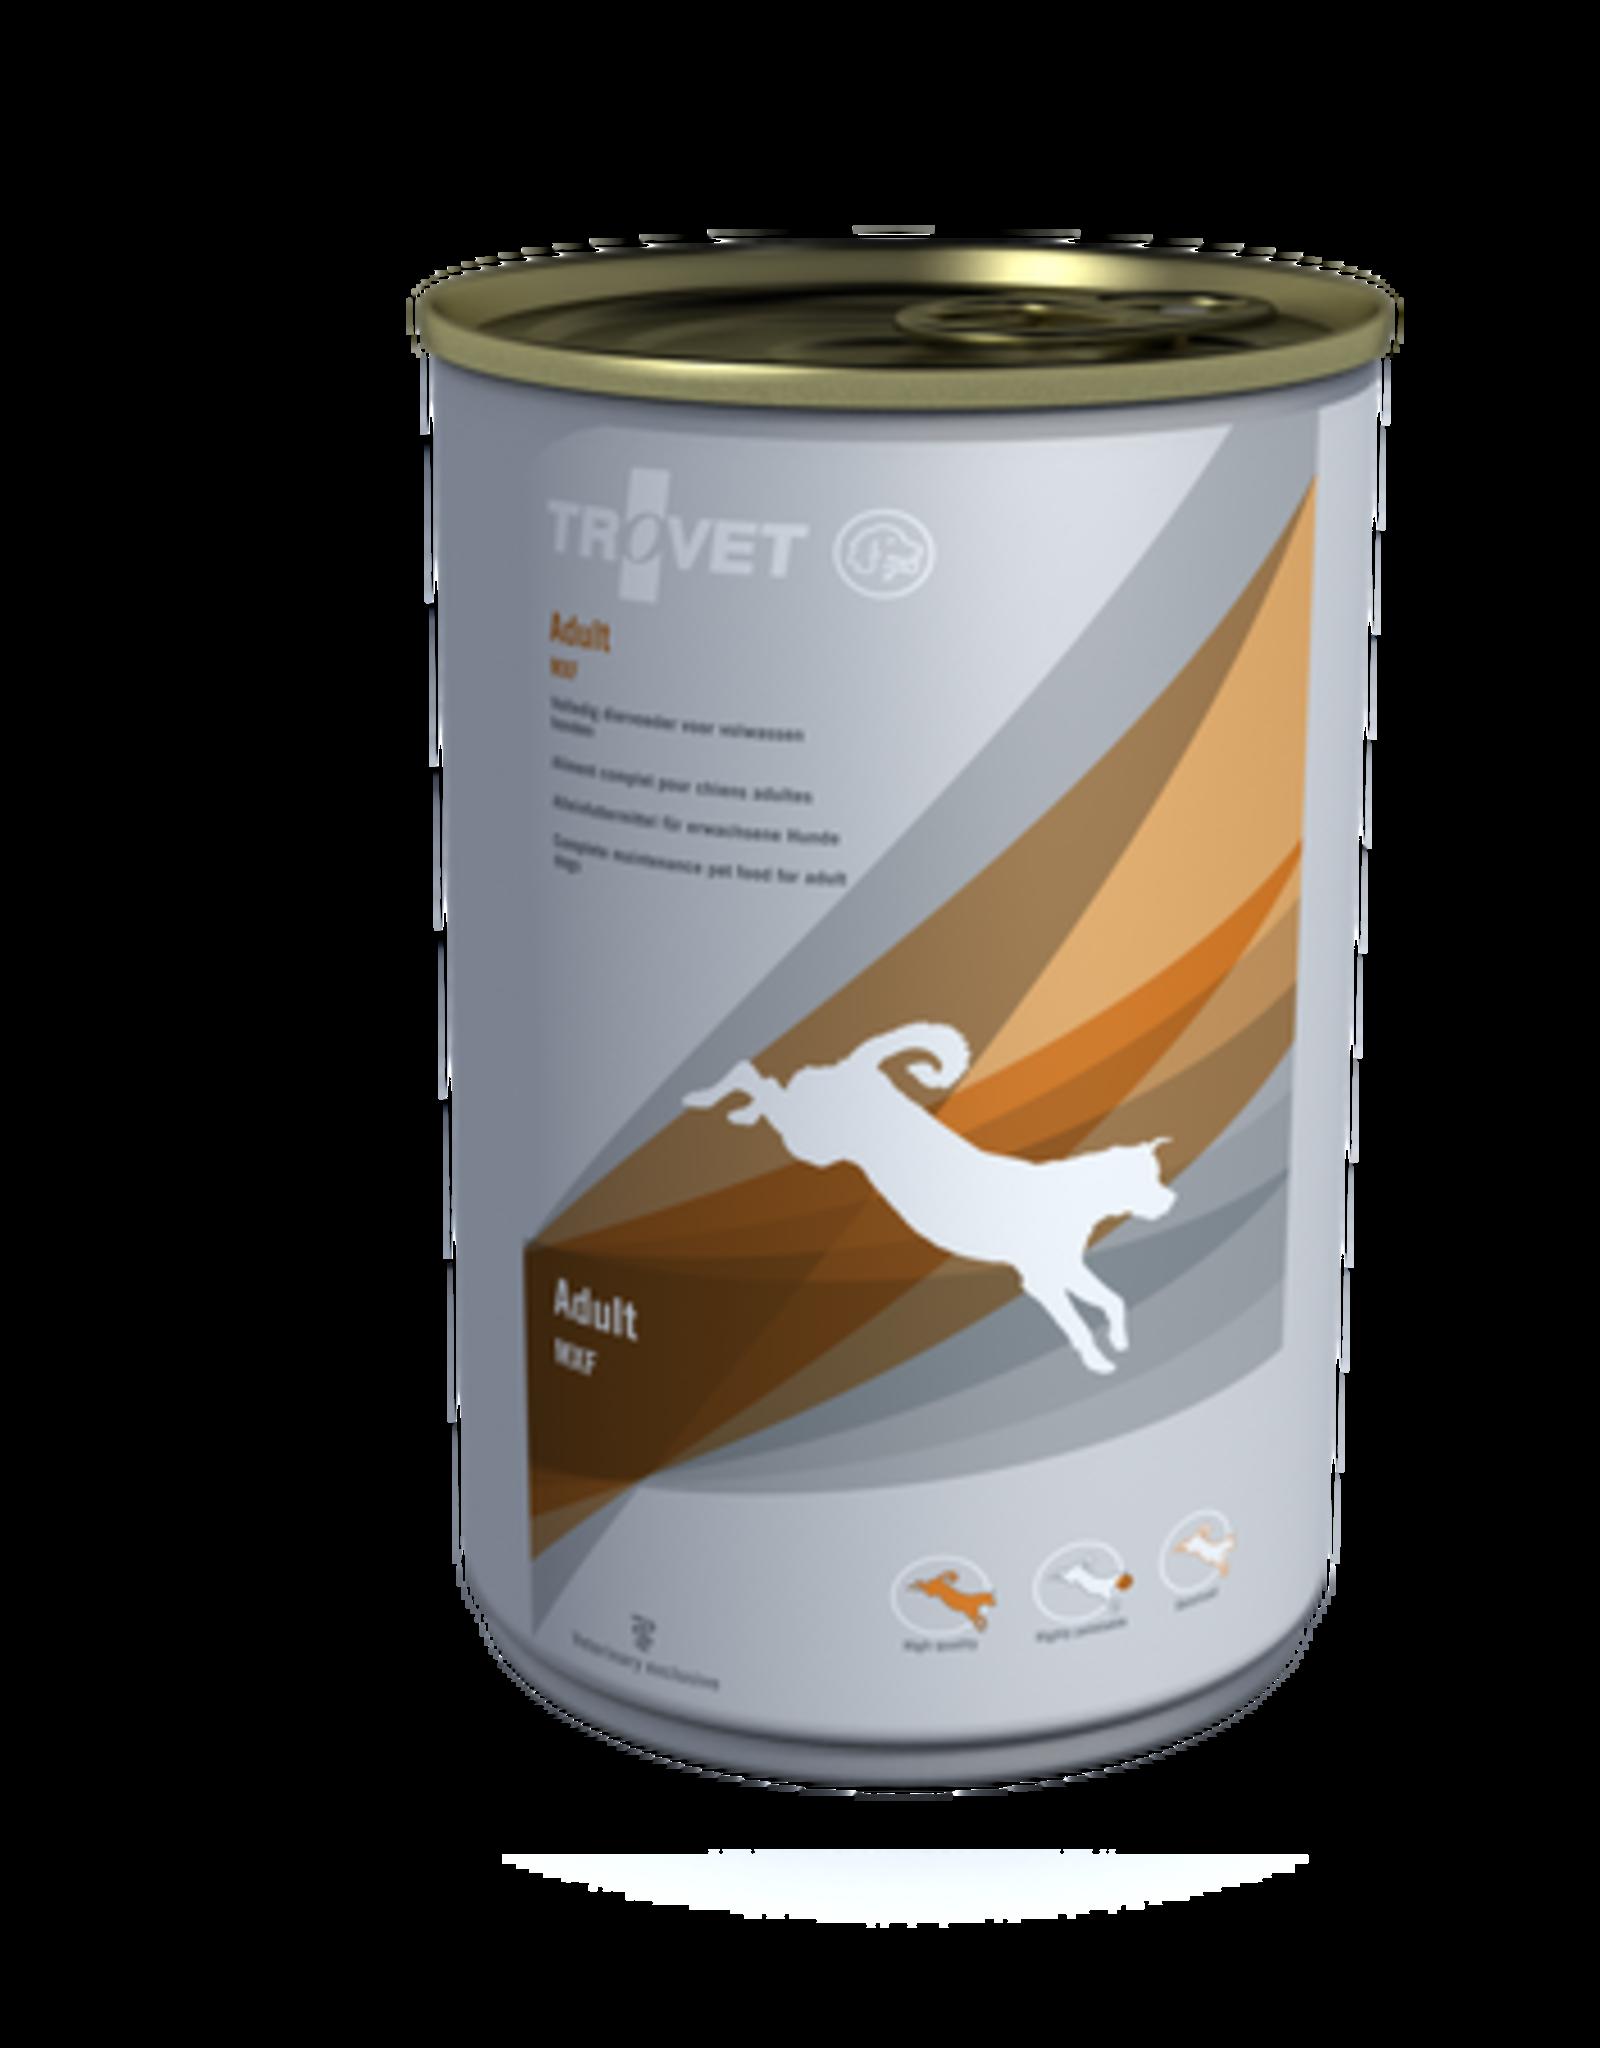 Trovet Trovet Mxf Adult Hond 6x400g